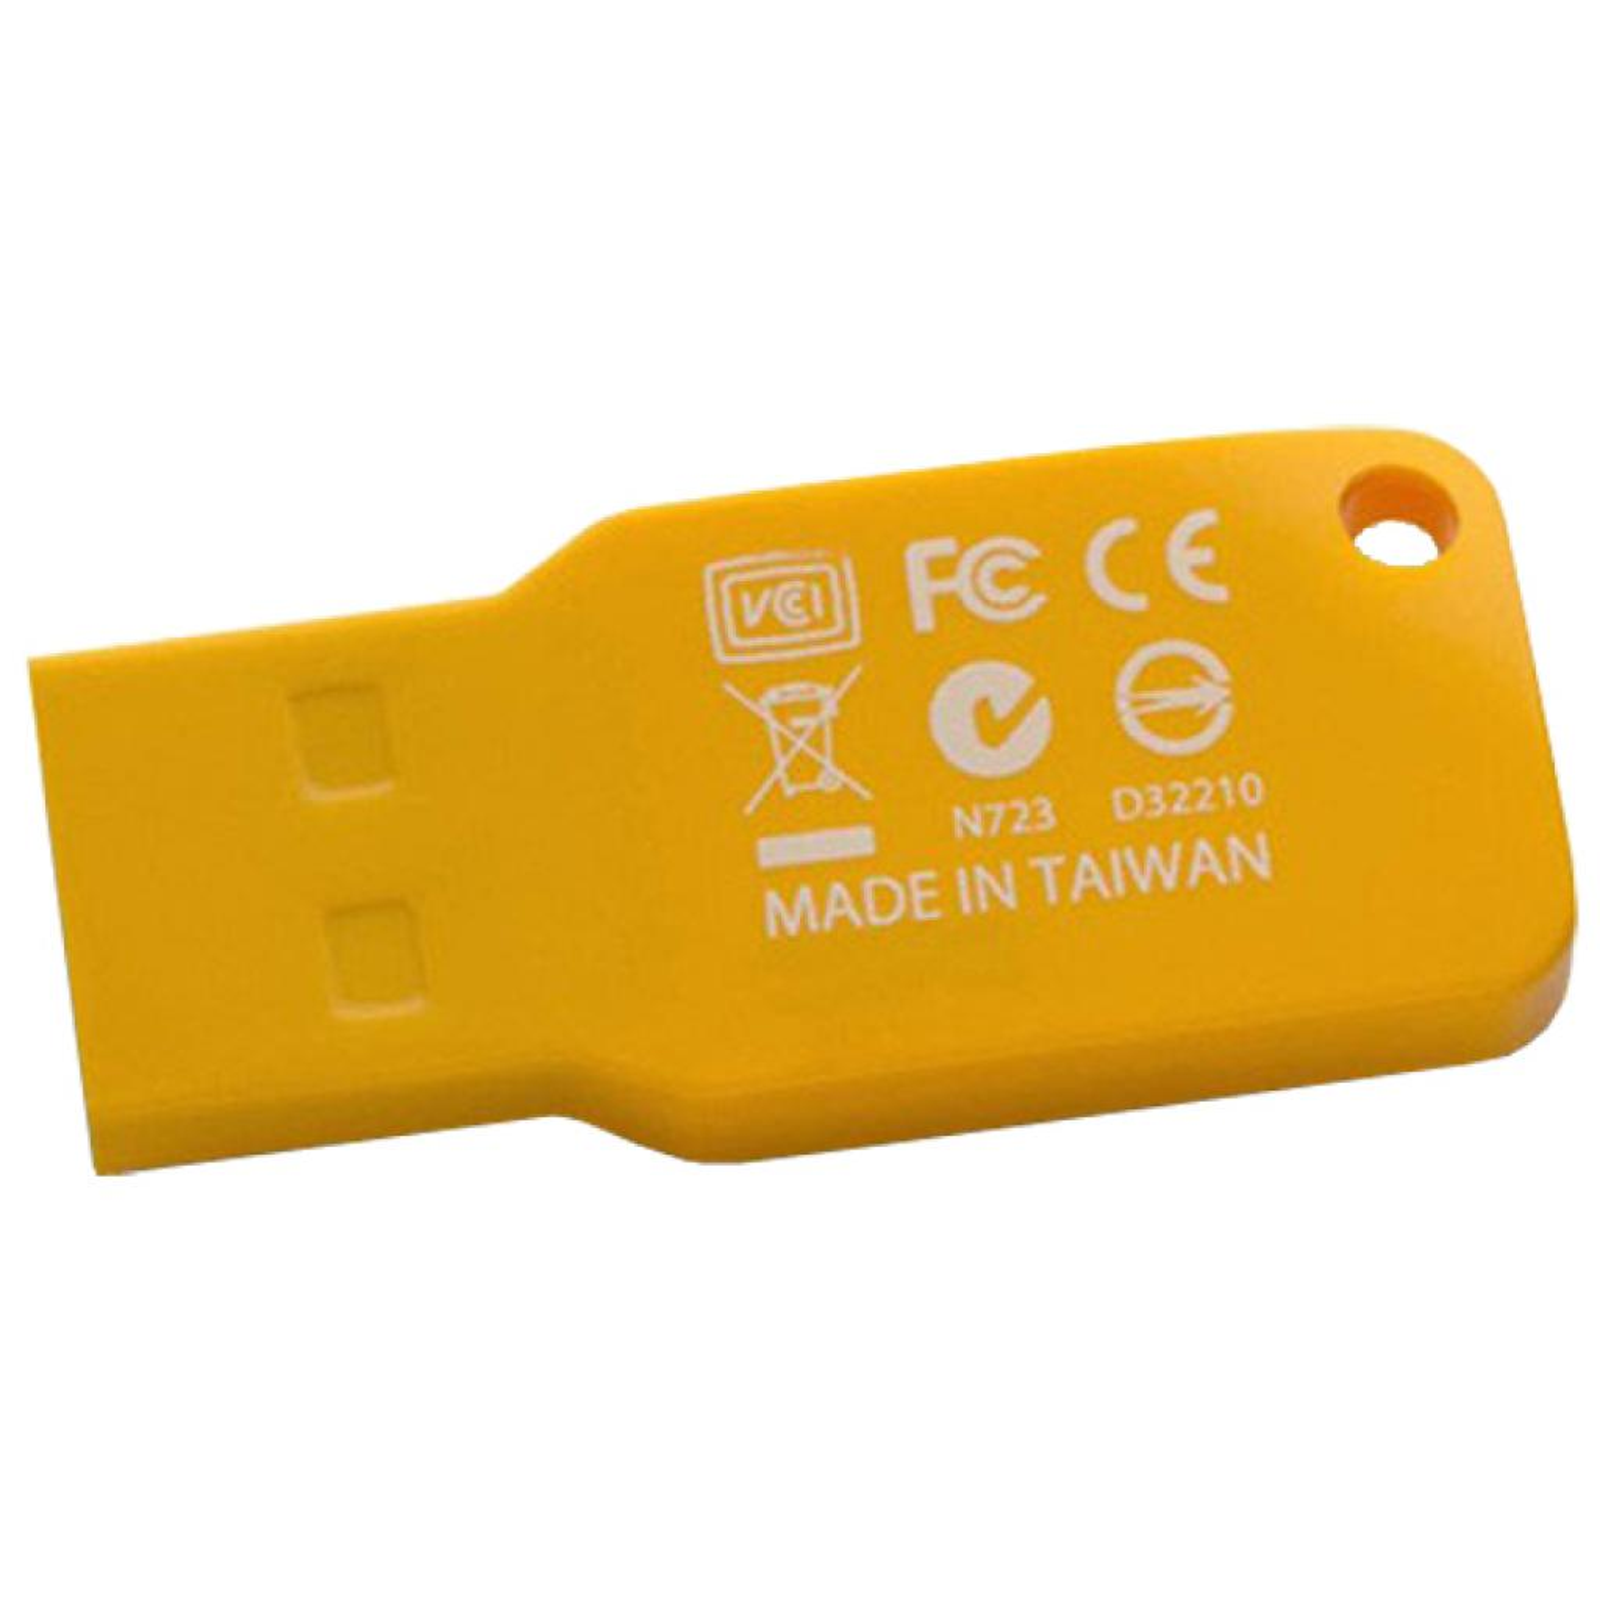 USB флеш накопитель TOSHIBA 8GB Mikawa Yellow USB 2.0 (THN-U201Y0080M4) изображение 2